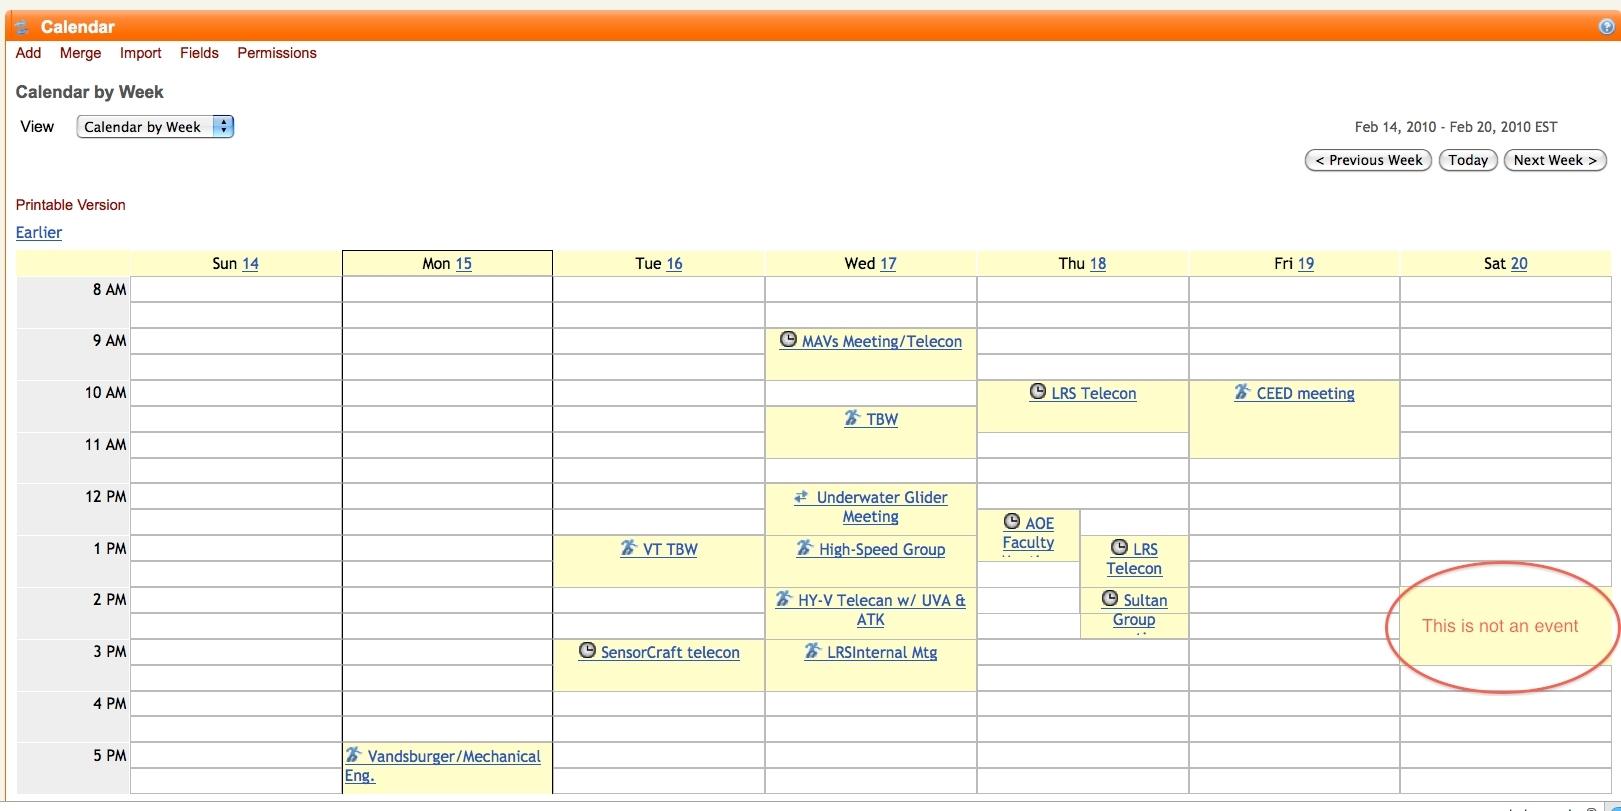 Weekly Printable Calendars With Time Slots - Calendar